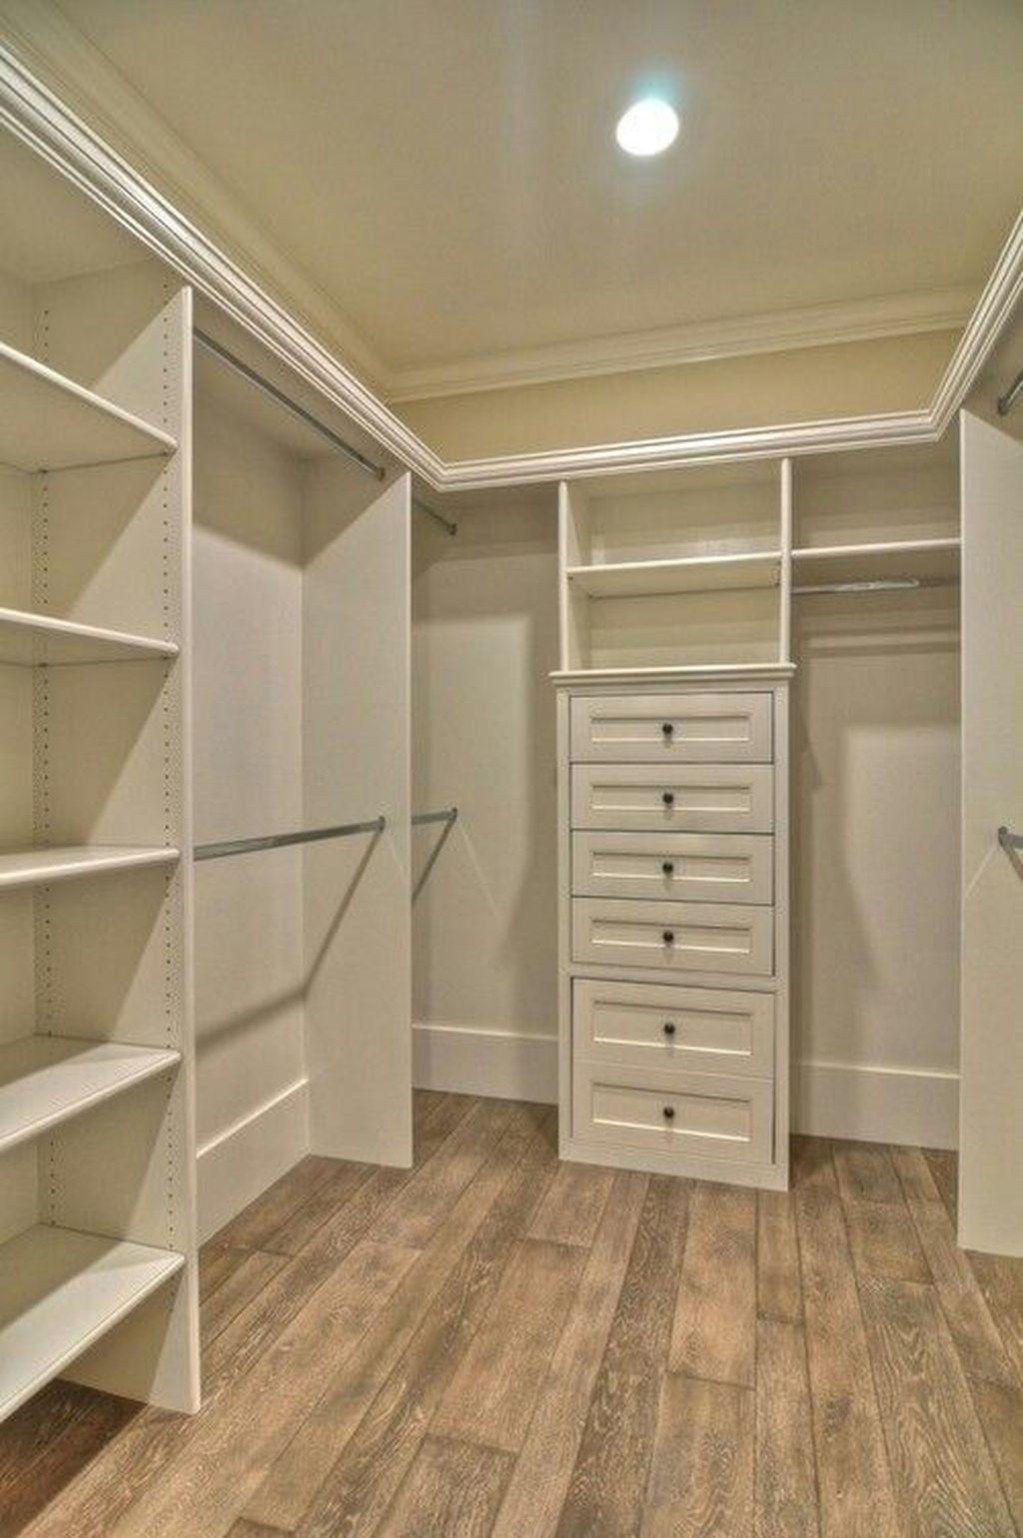 48 Adorable Master Bedroom Closet Designs Ideas In 2020 Closet